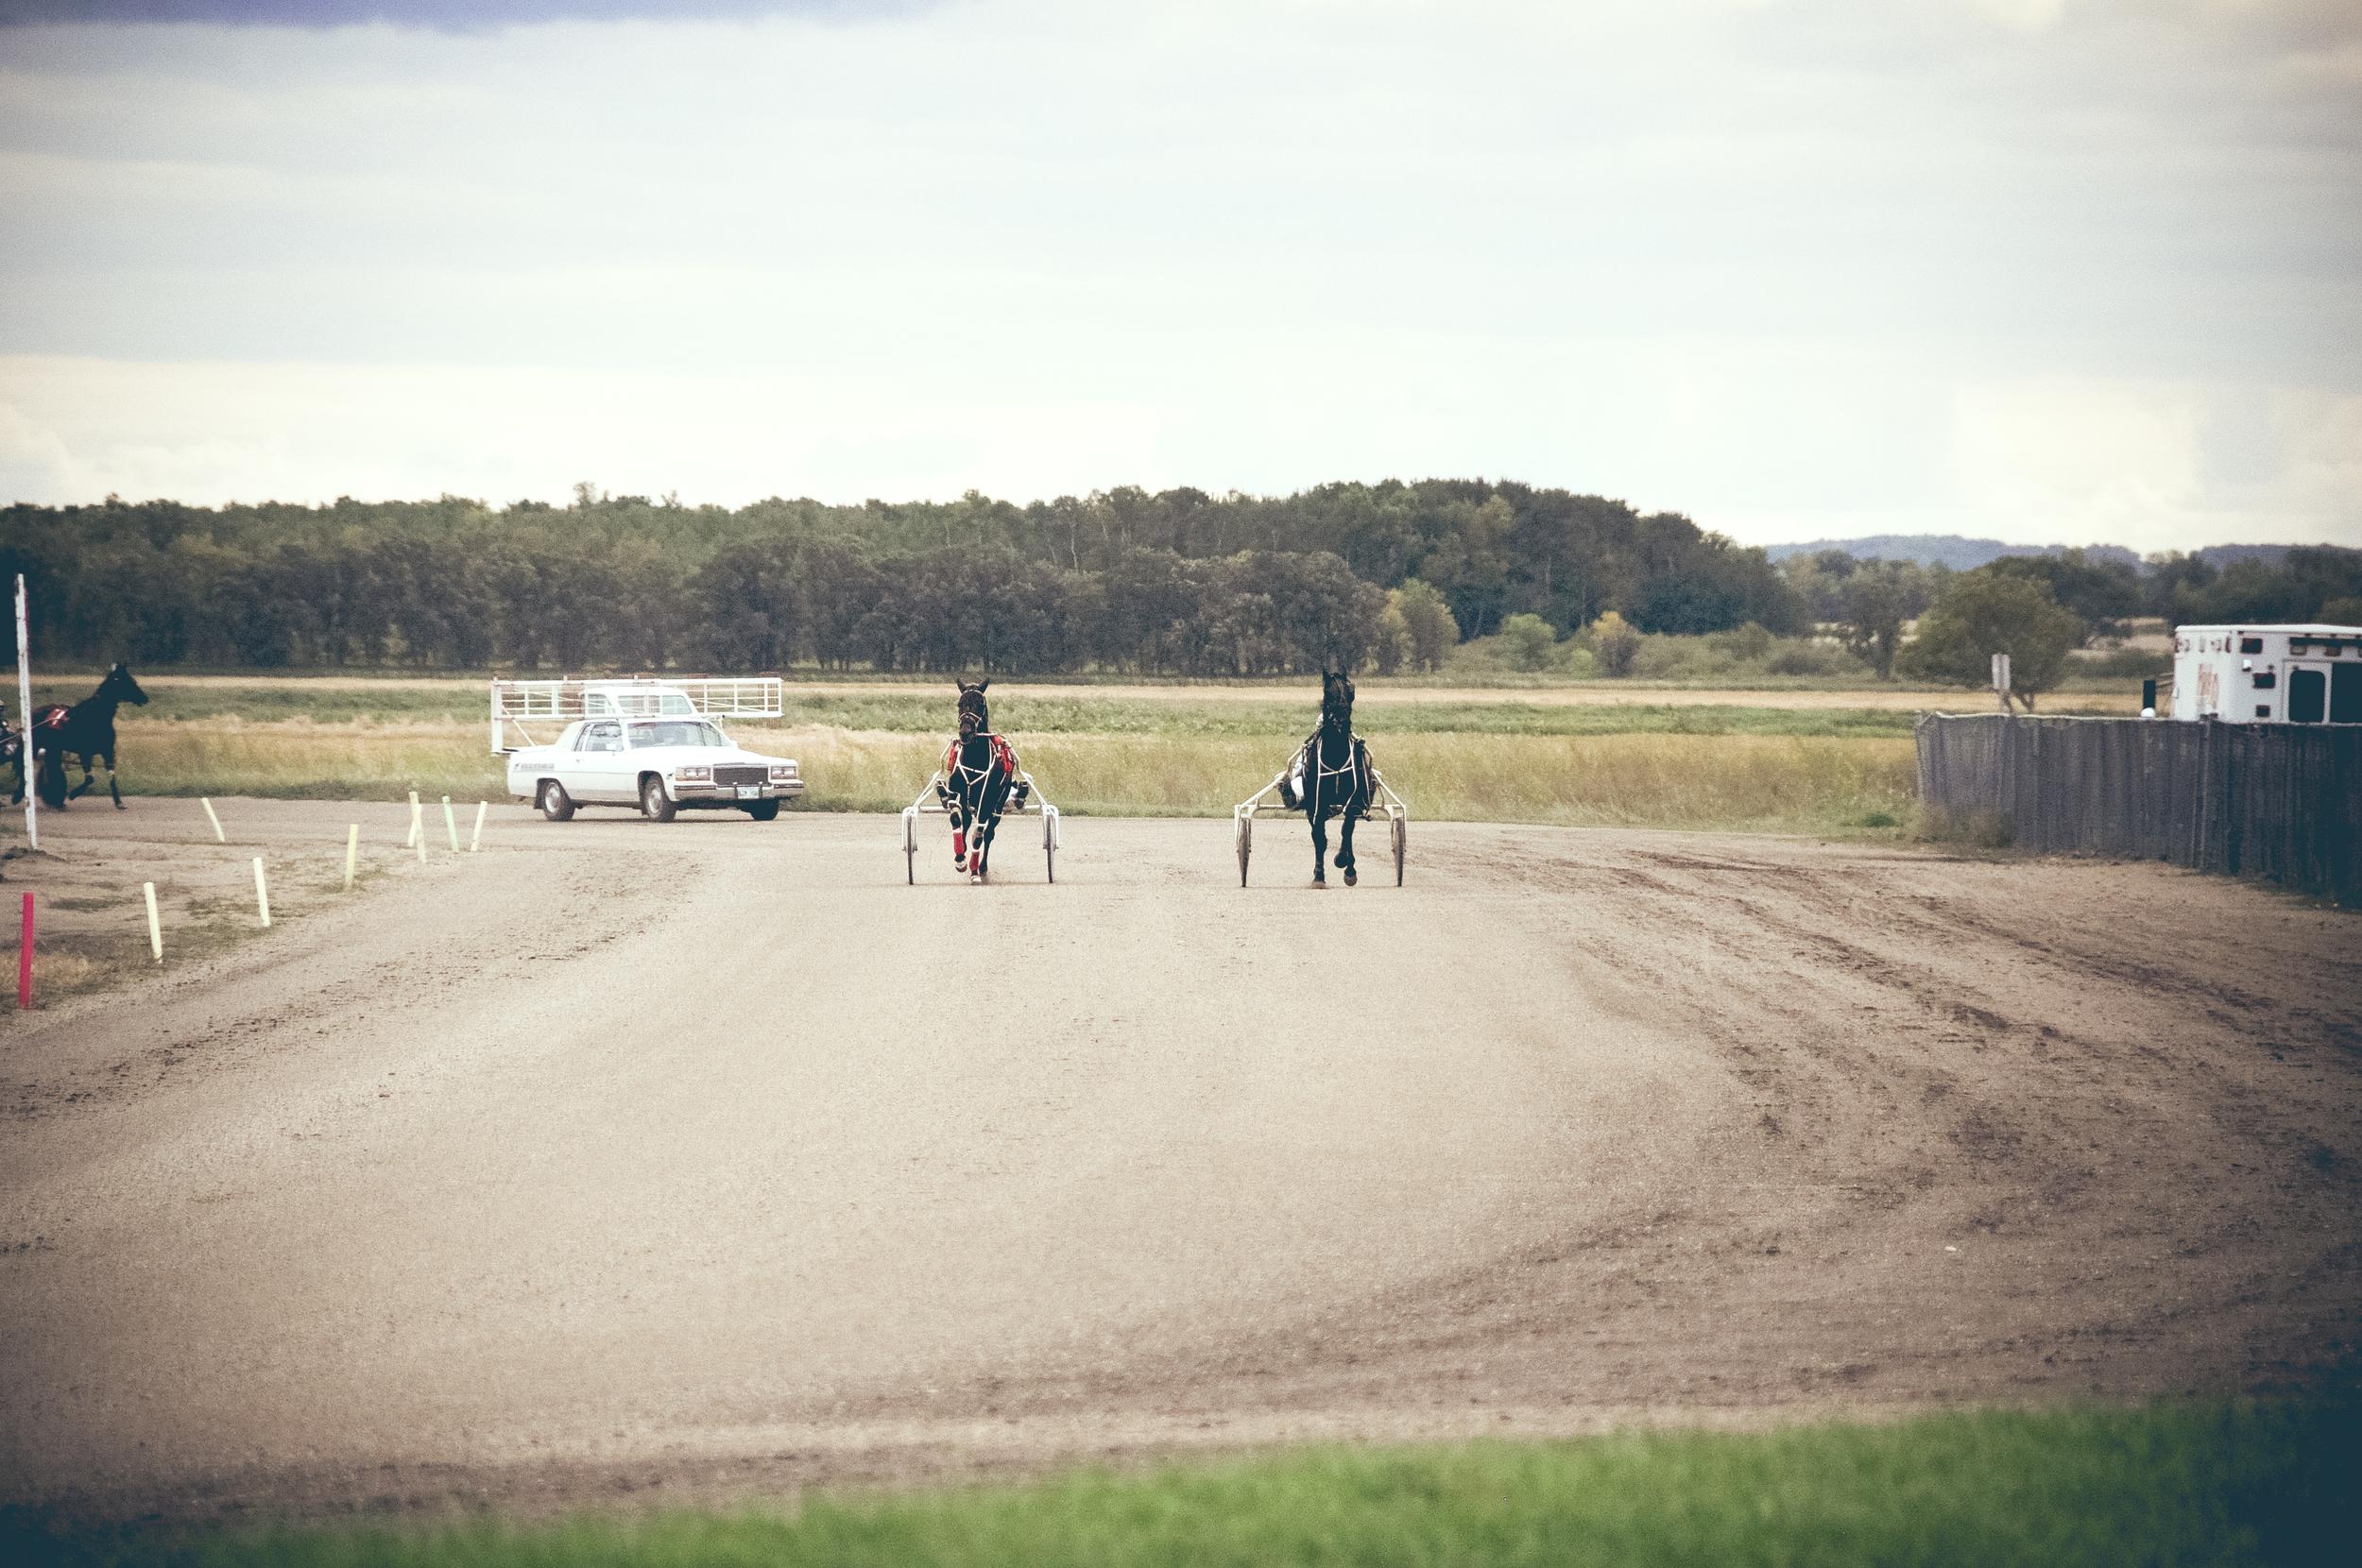 race_track-1.jpg